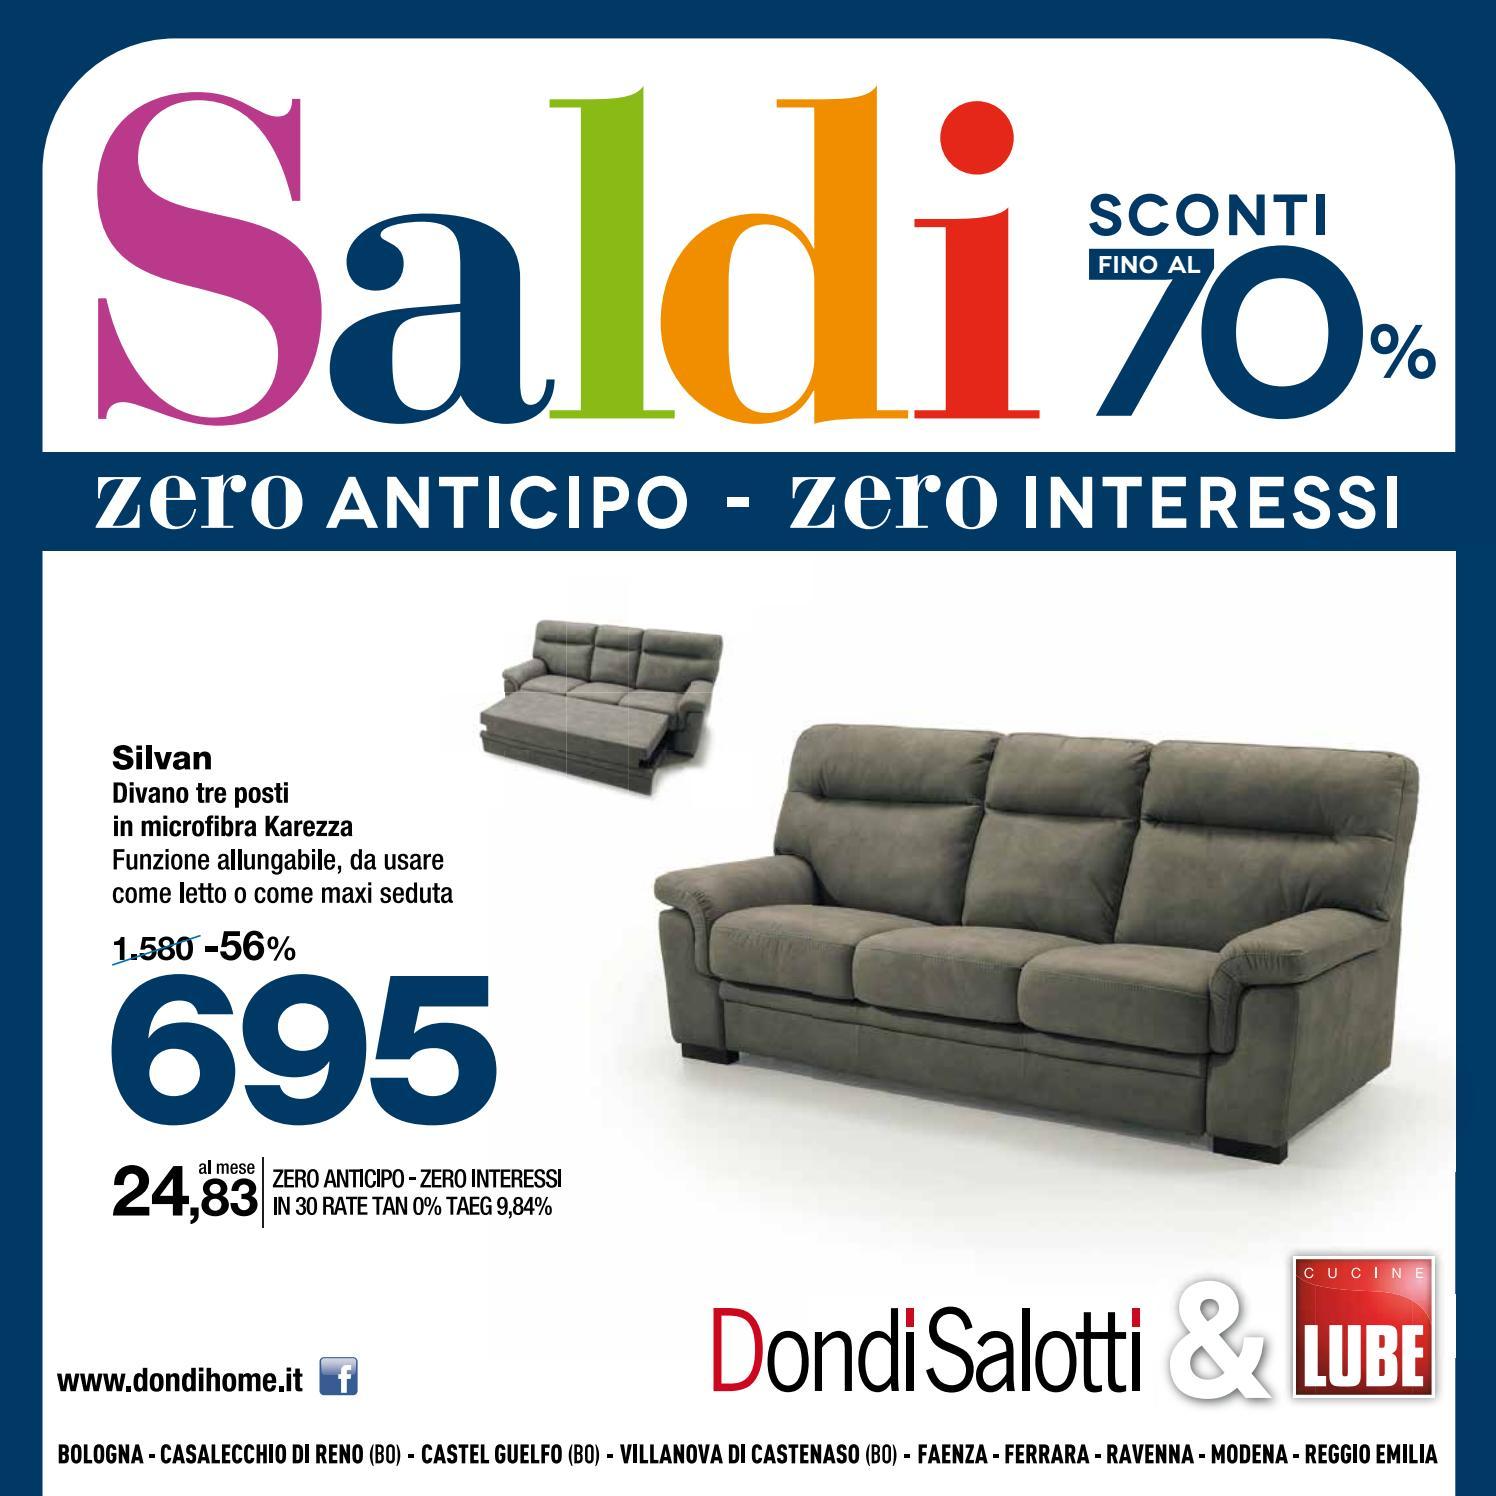 Dondi Salotti Natale 2017 by Michele Travagli - issuu